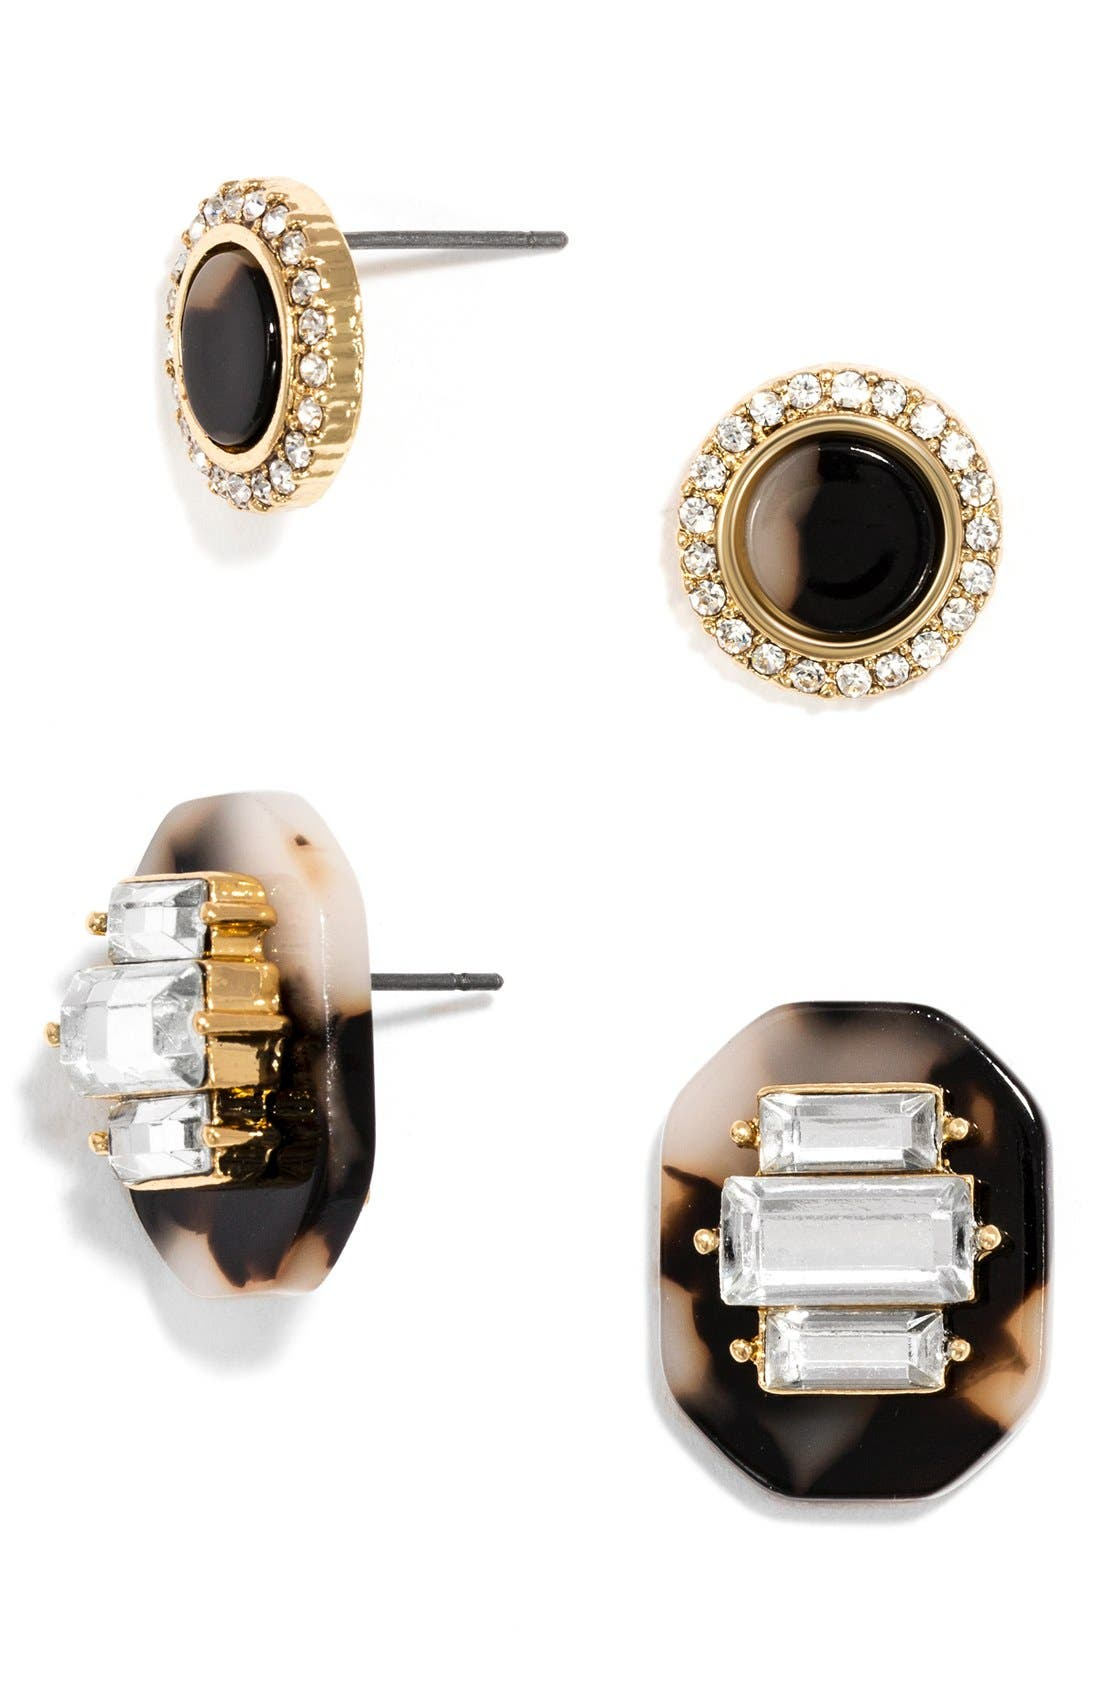 Main Image - BaubleBar 'Buchanan' Crystal & Tortoiseshell Earrings (Set of 2)